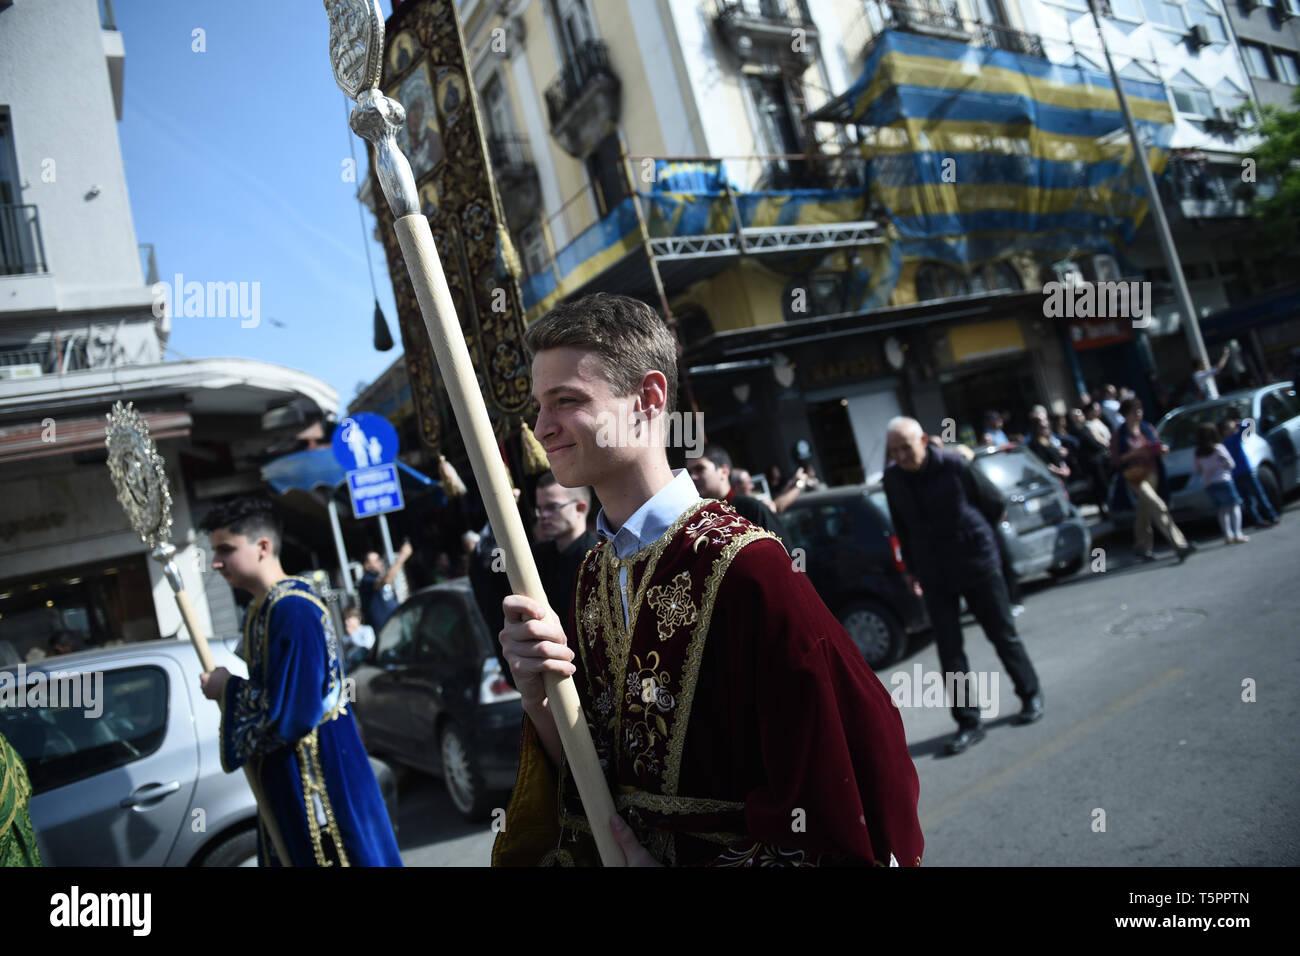 Thessaloniki, Greece  26th Apr, 2019  A Greek Orthodox